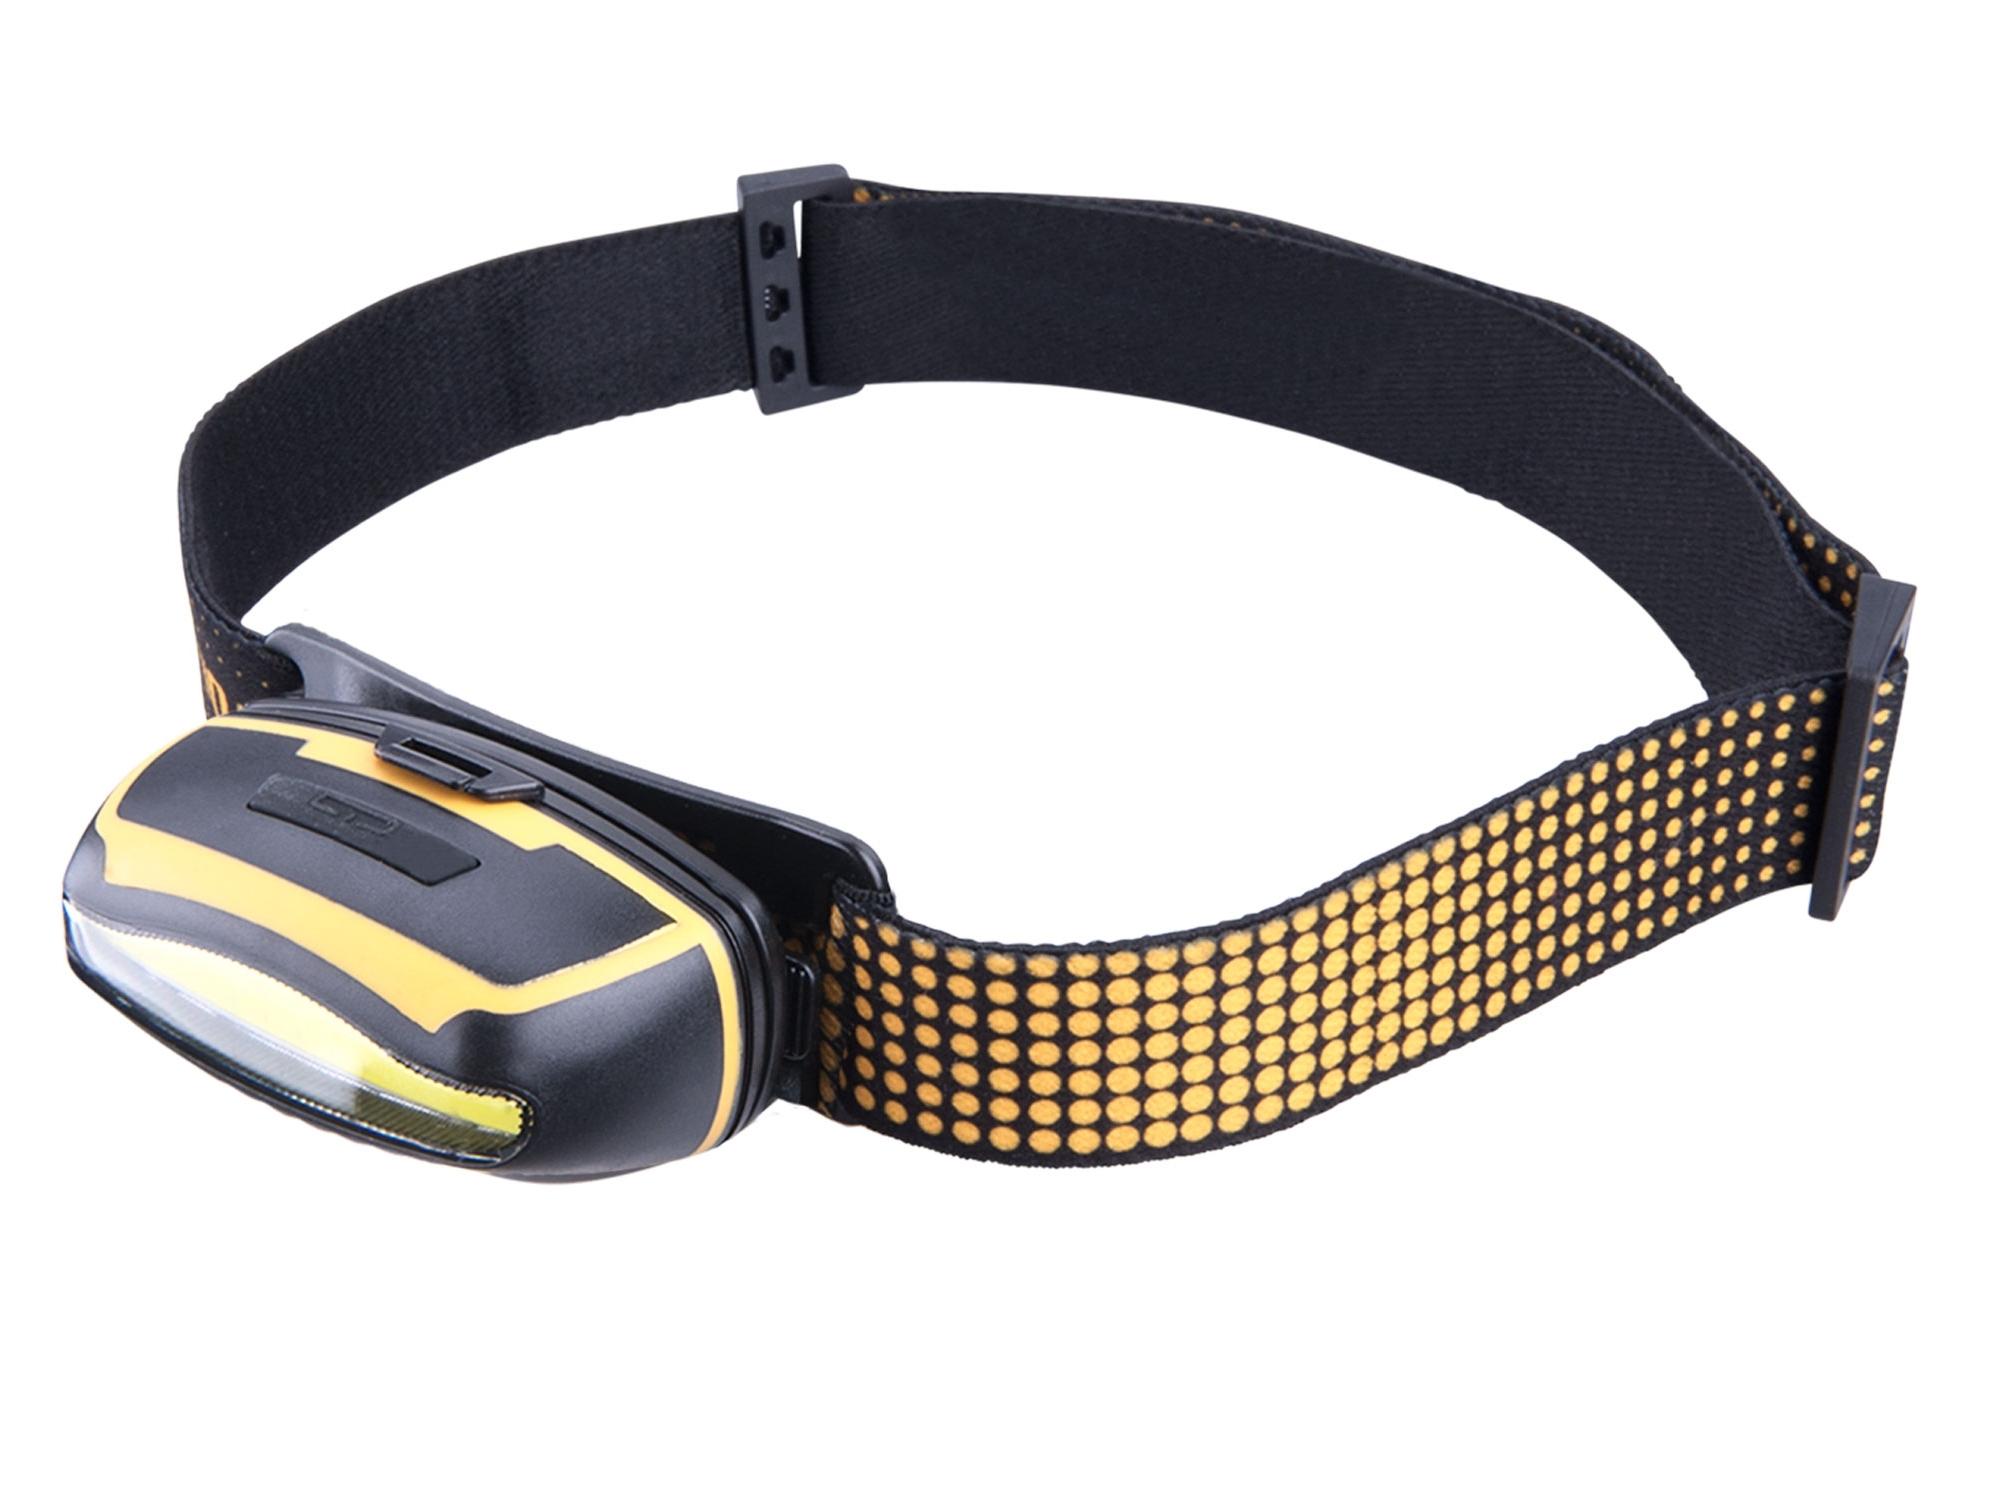 čelovka širokoúhlá 300lm, 5W COB LED